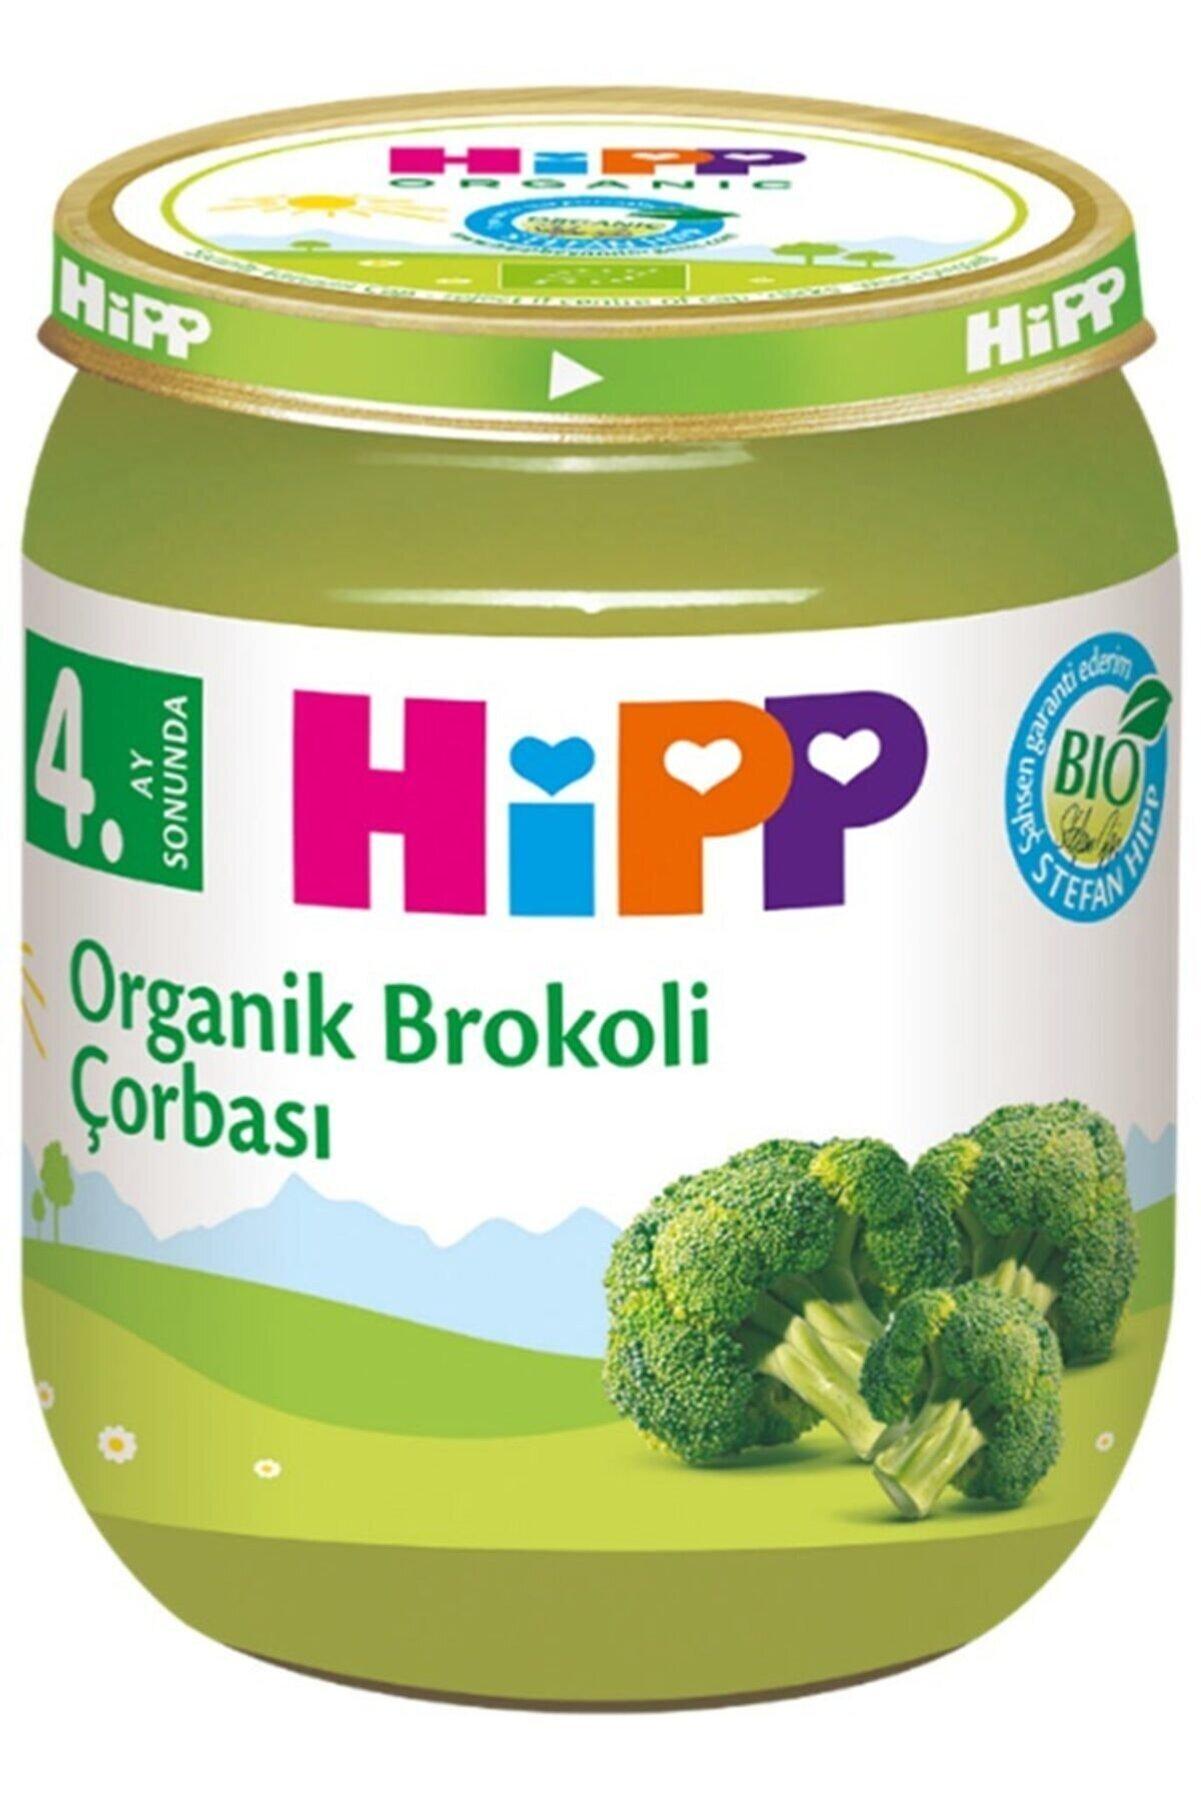 Hipp Organik Brokoli Çorbası 125gr 4. Ay Sonunda